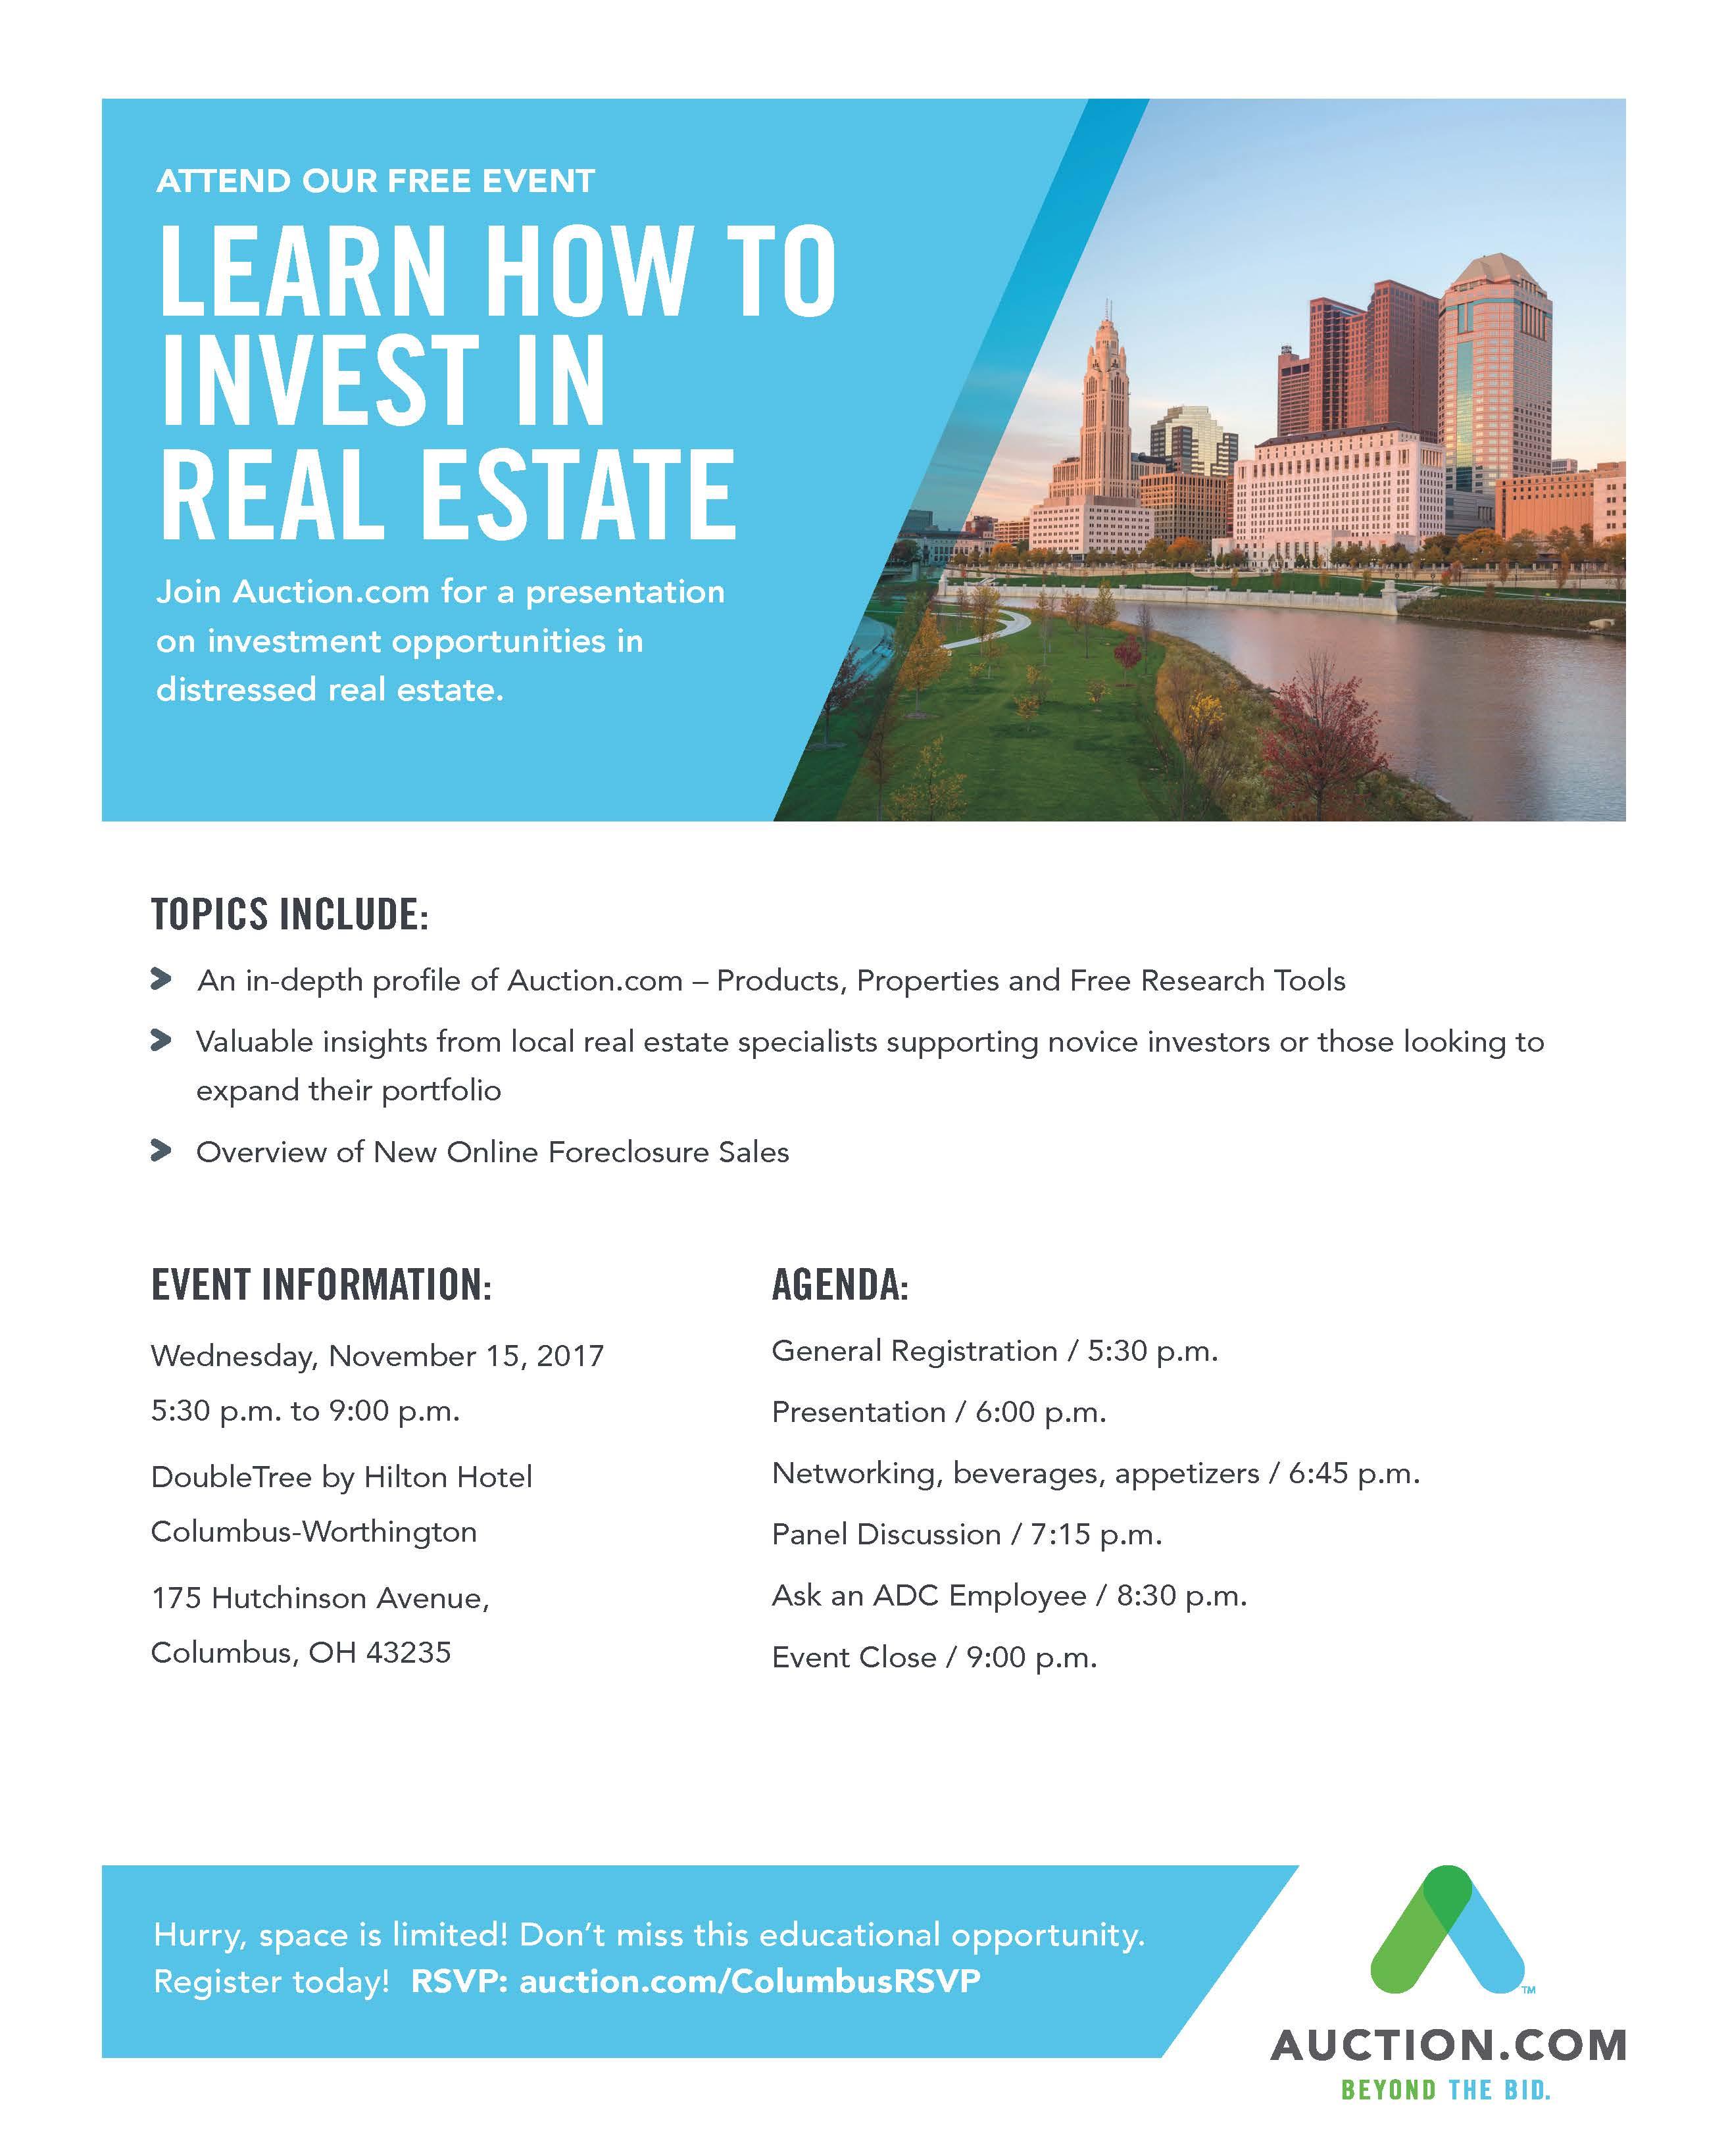 Nov 15th Columbus, OH - Auction.com FREE Seminar